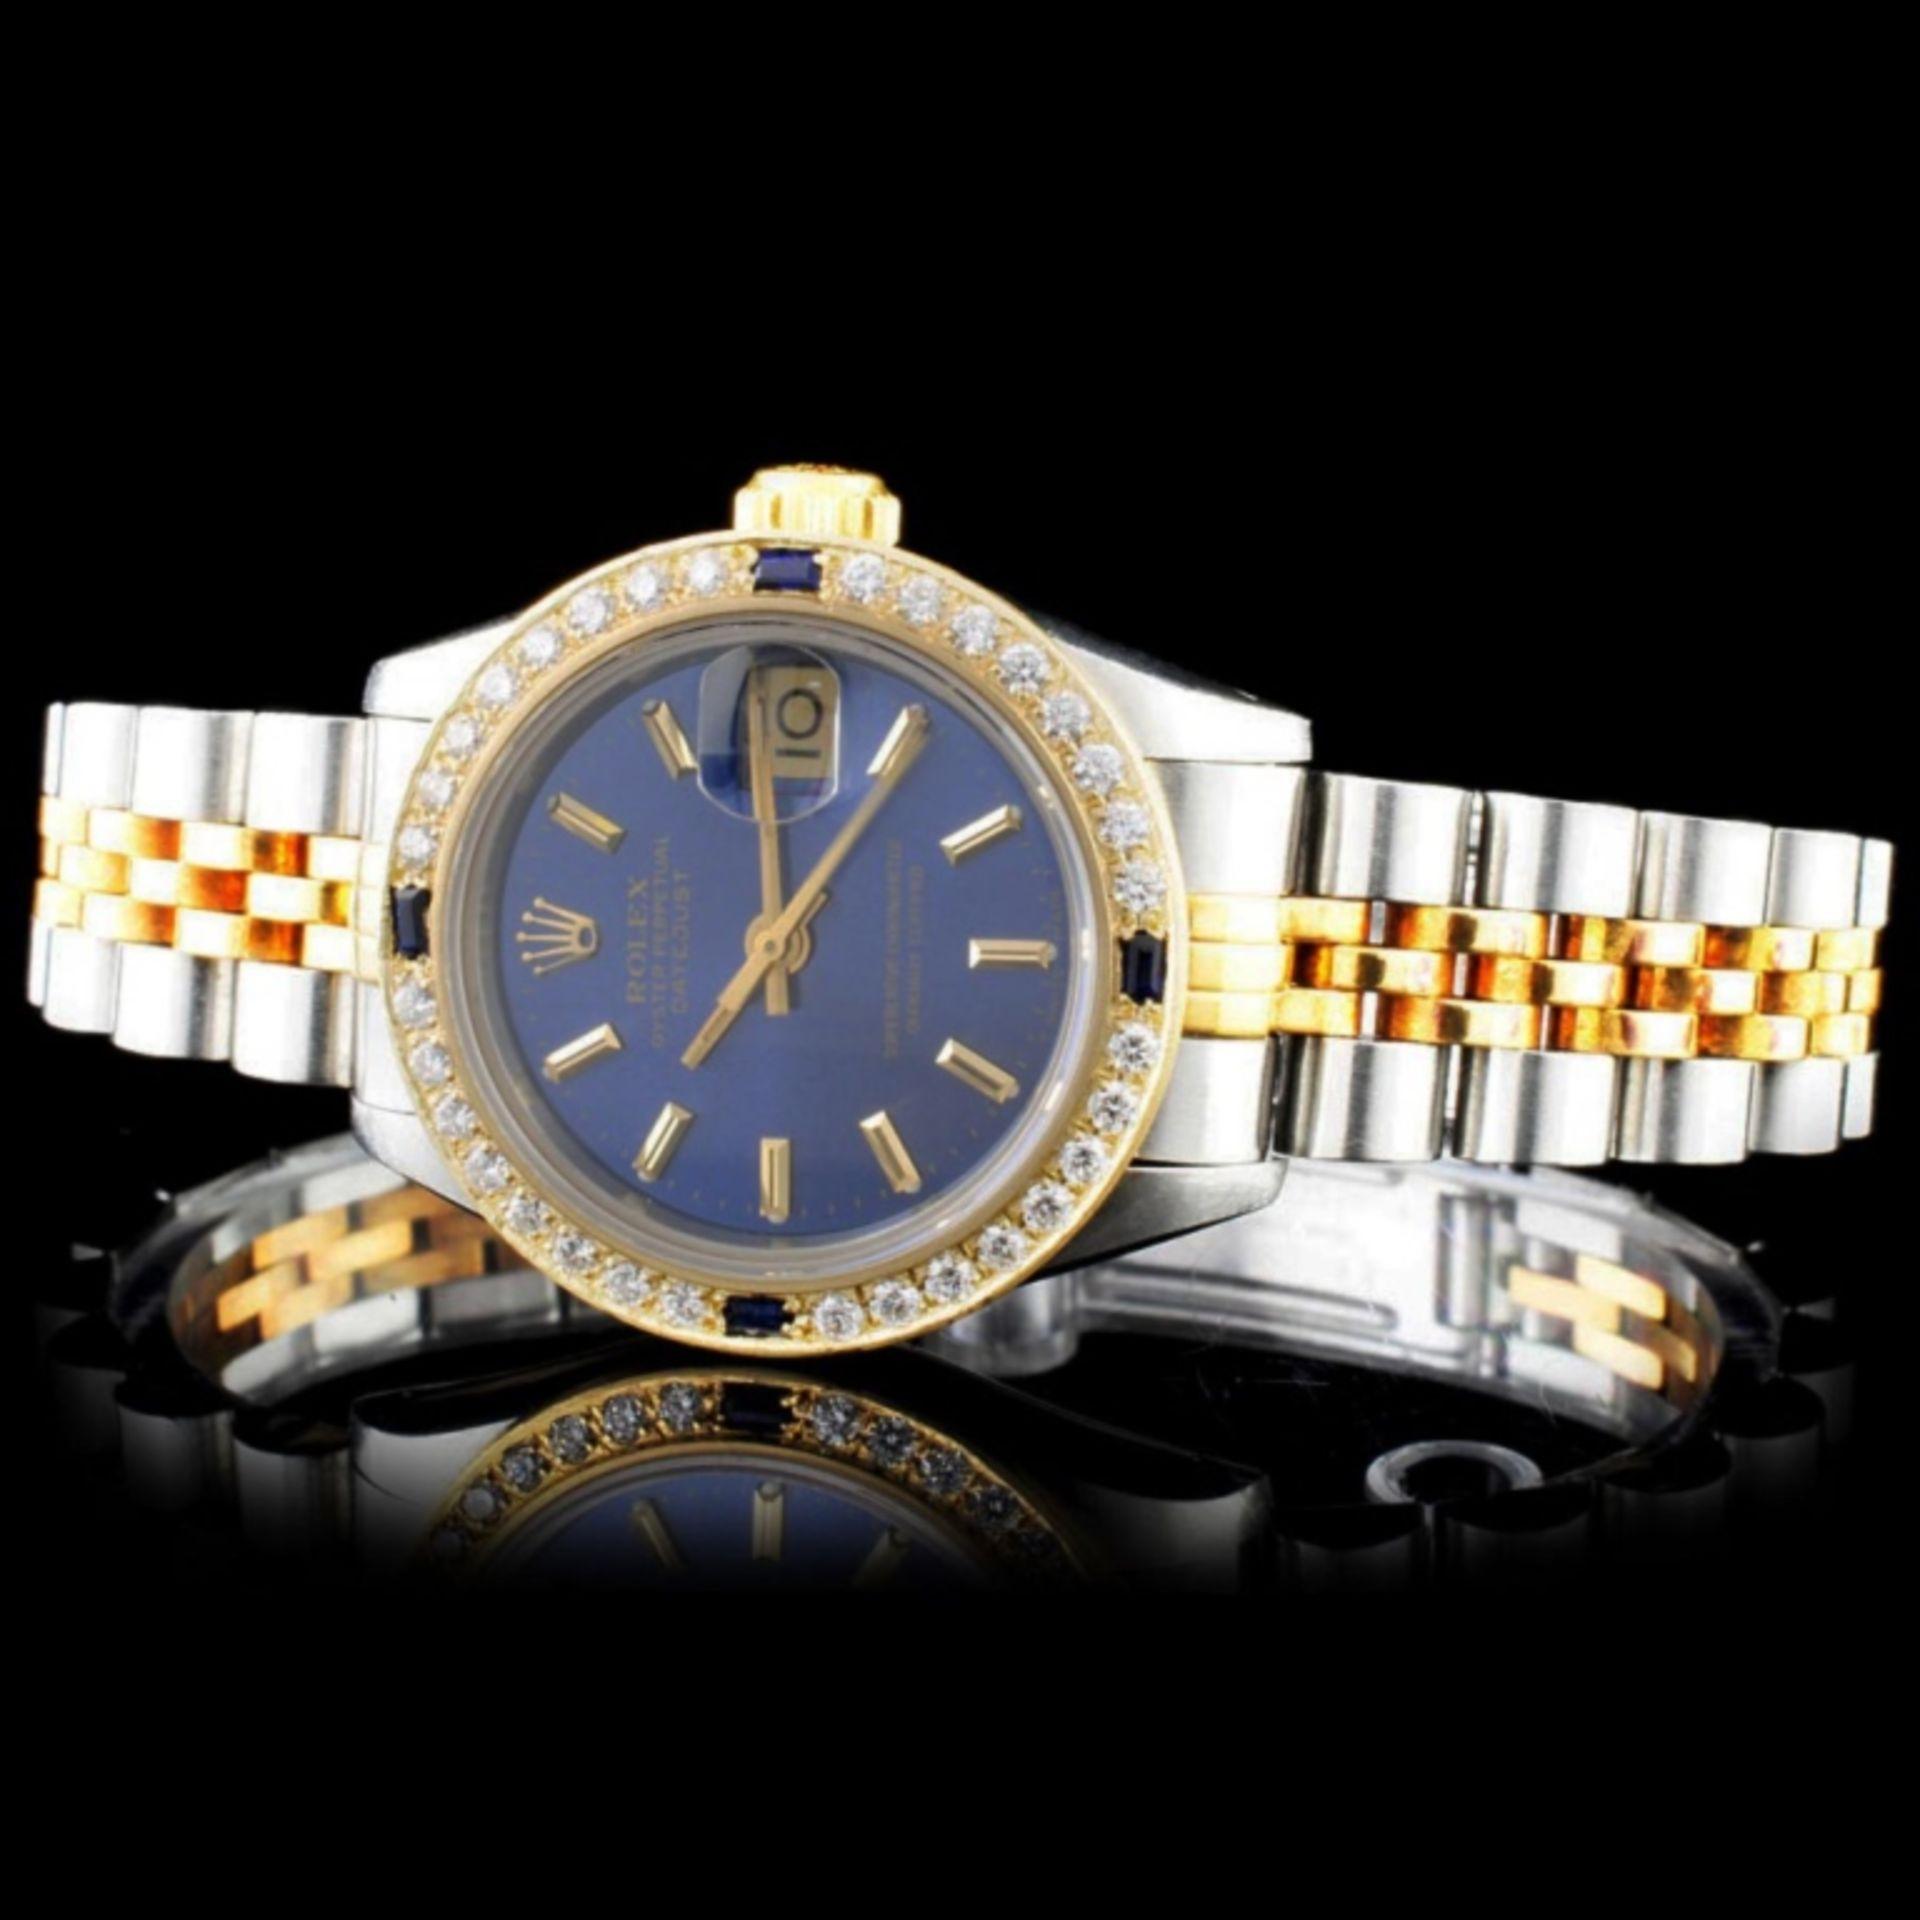 Rolex YG/SS DateJust 1.00ct Diamond Ladies Wristwa - Image 2 of 5